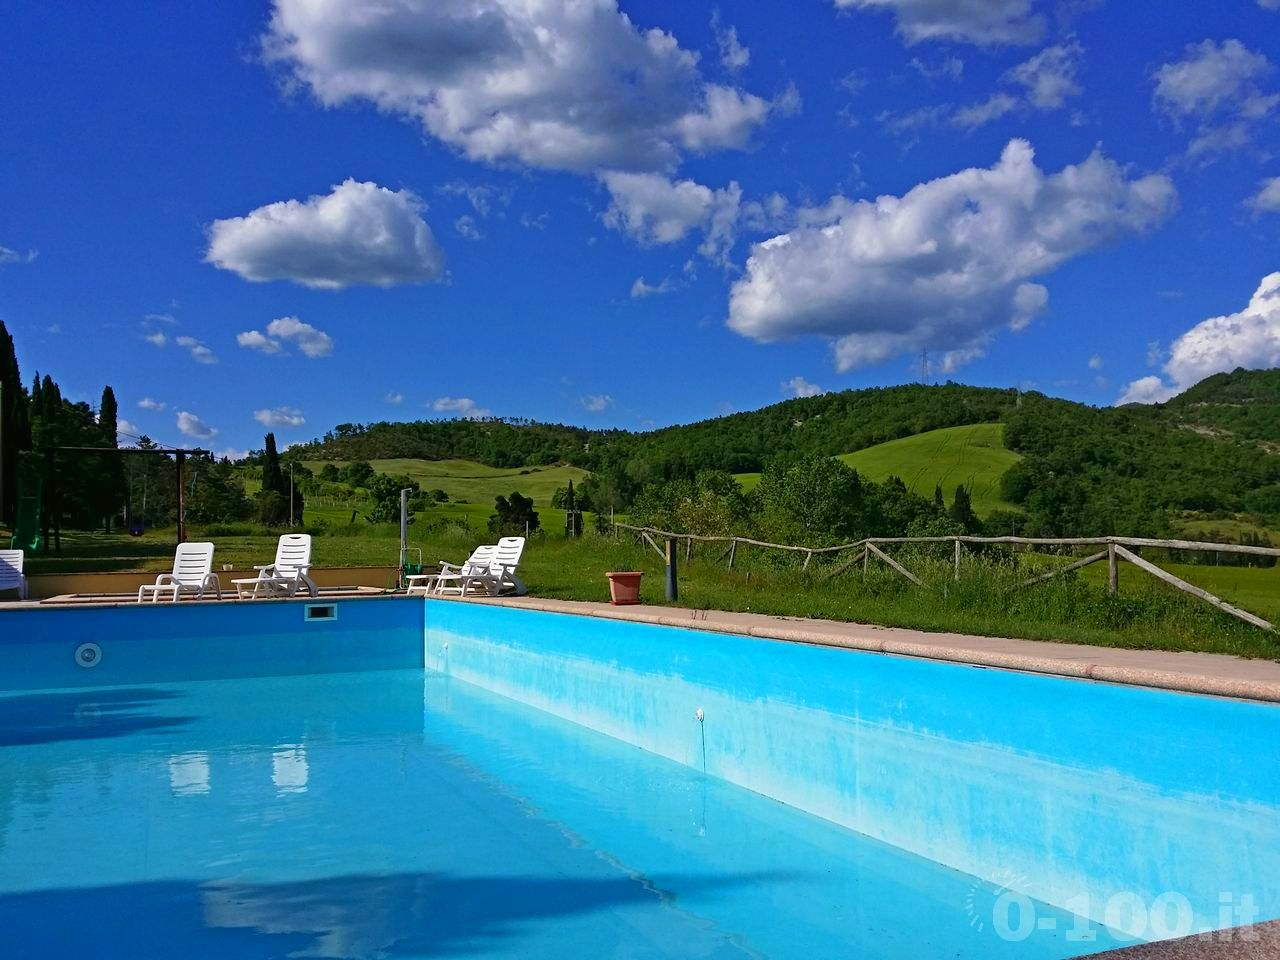 santa-felicita-paterna-turismo-umbria-agriturismo-vacanza-country-house-0-100_10